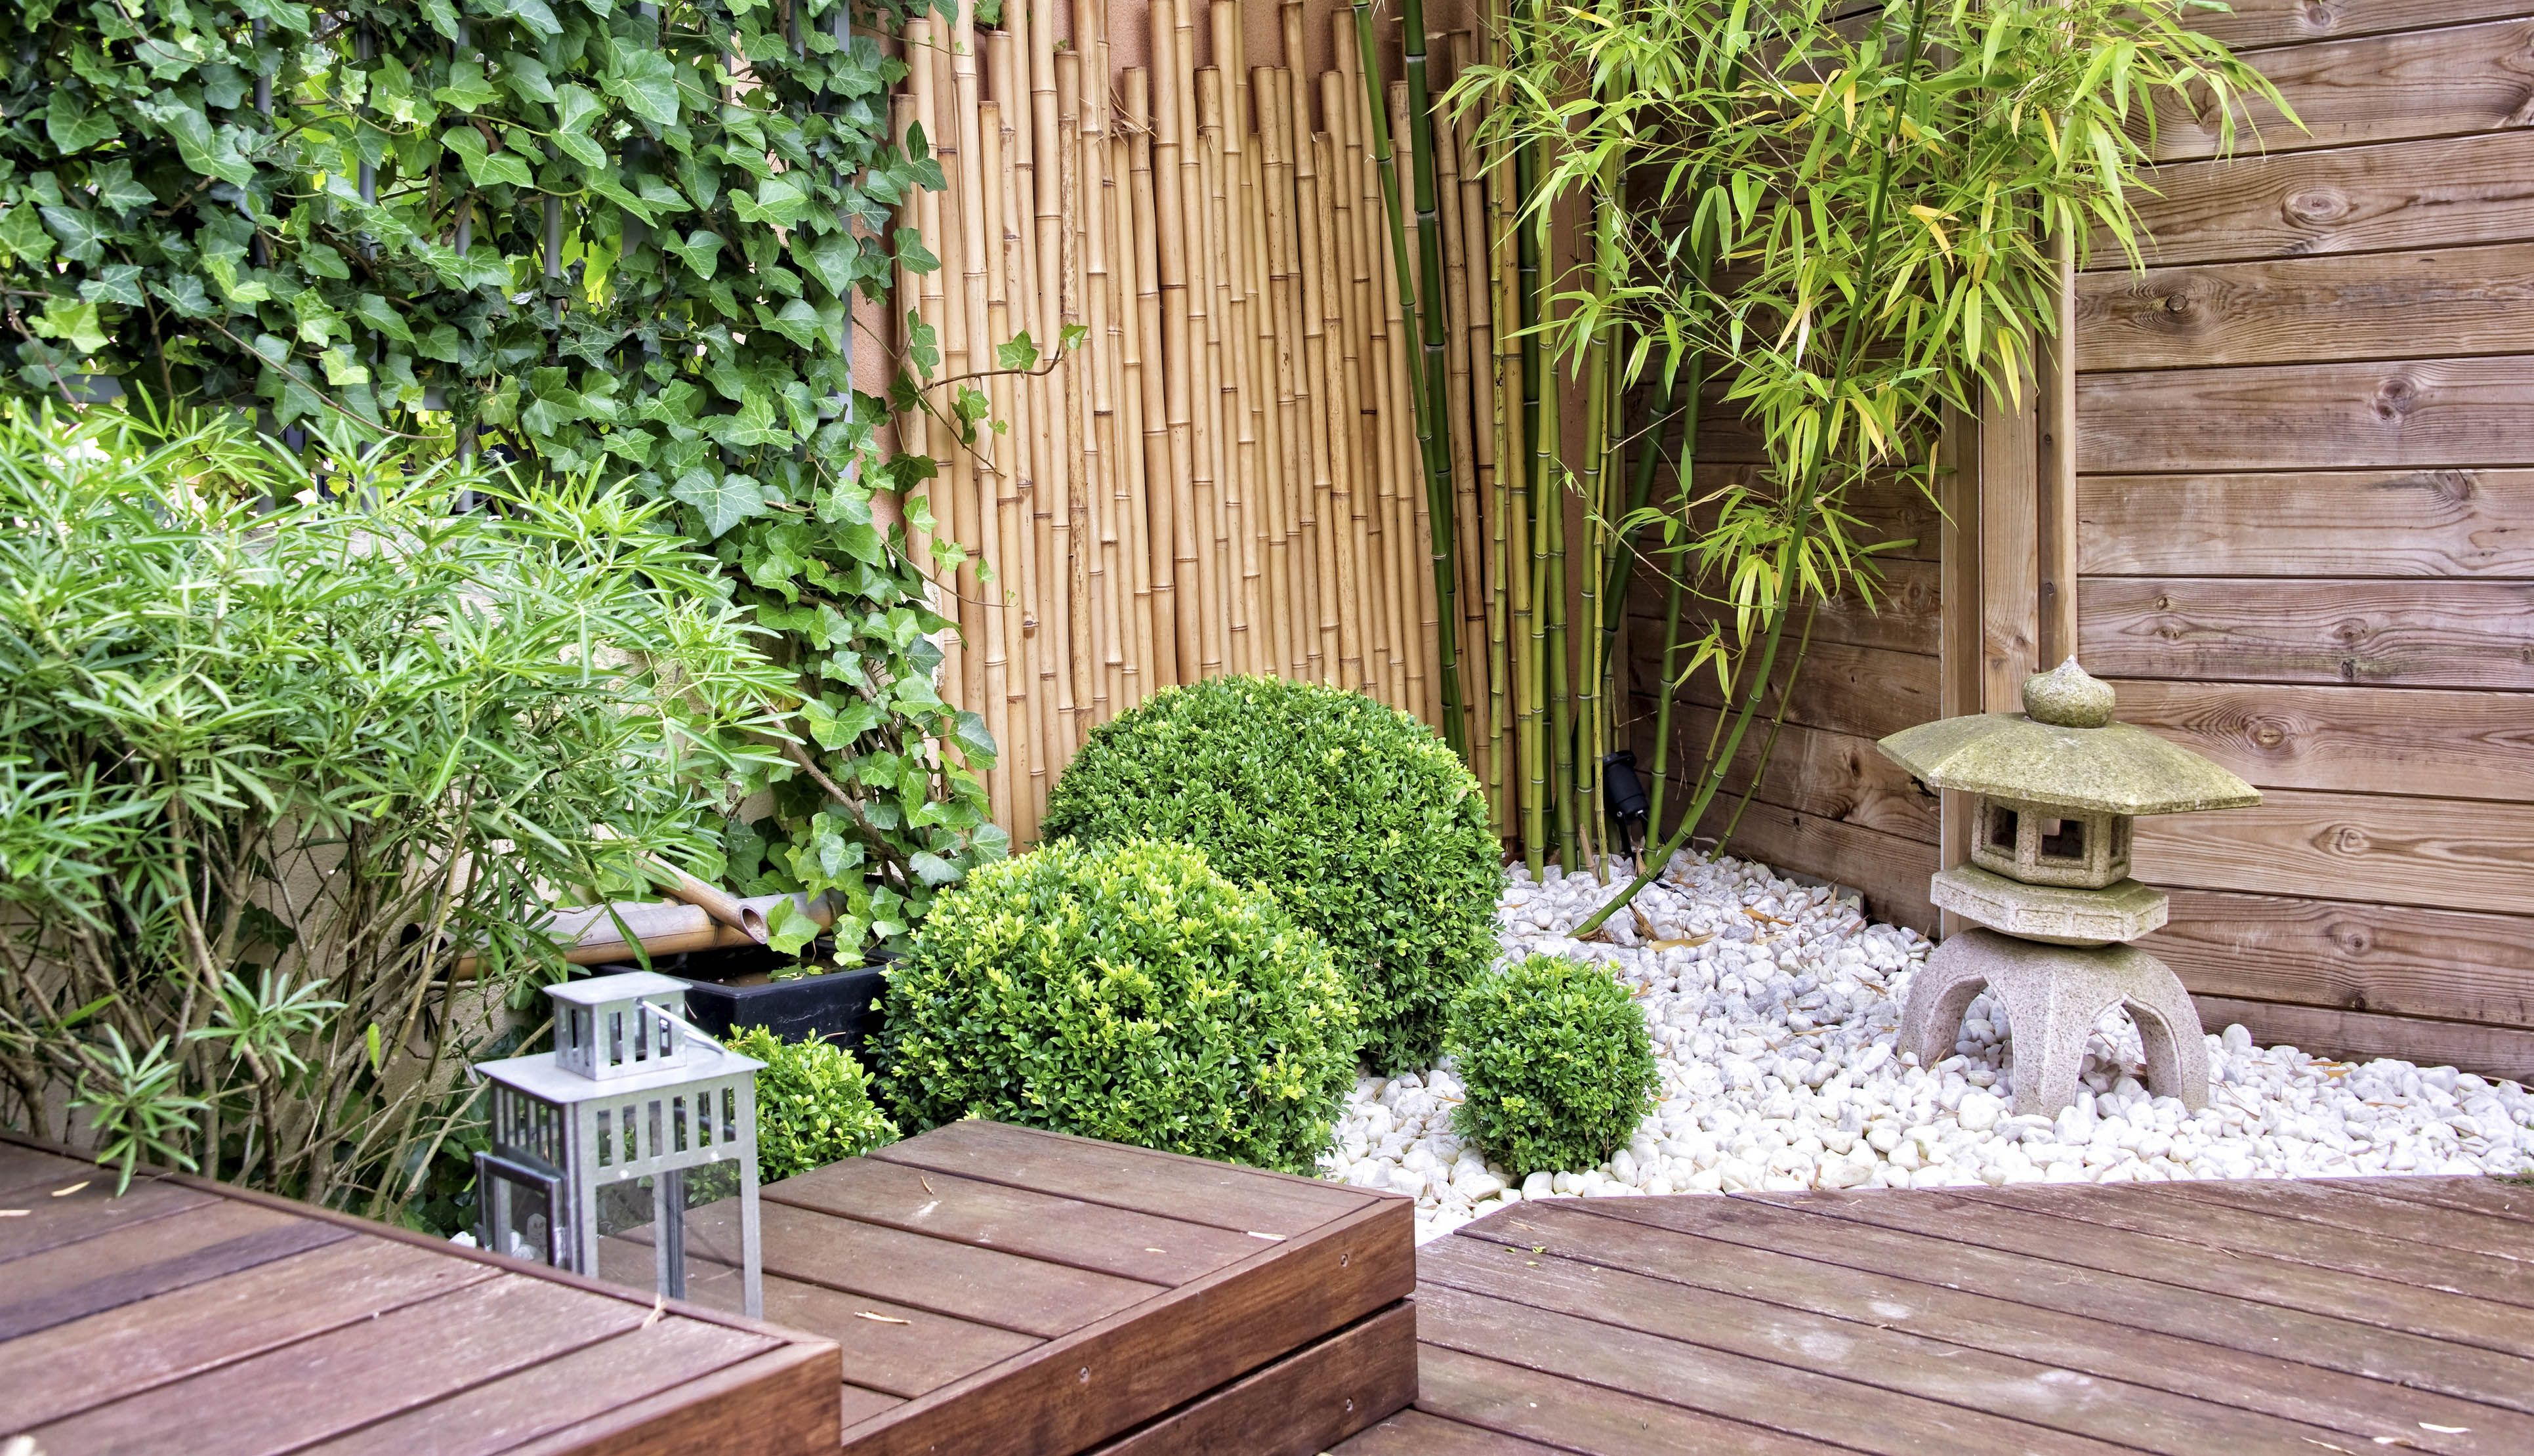 Tendance du jardin zen - Jardiland | jardin zen | Pinterest | Zen ...